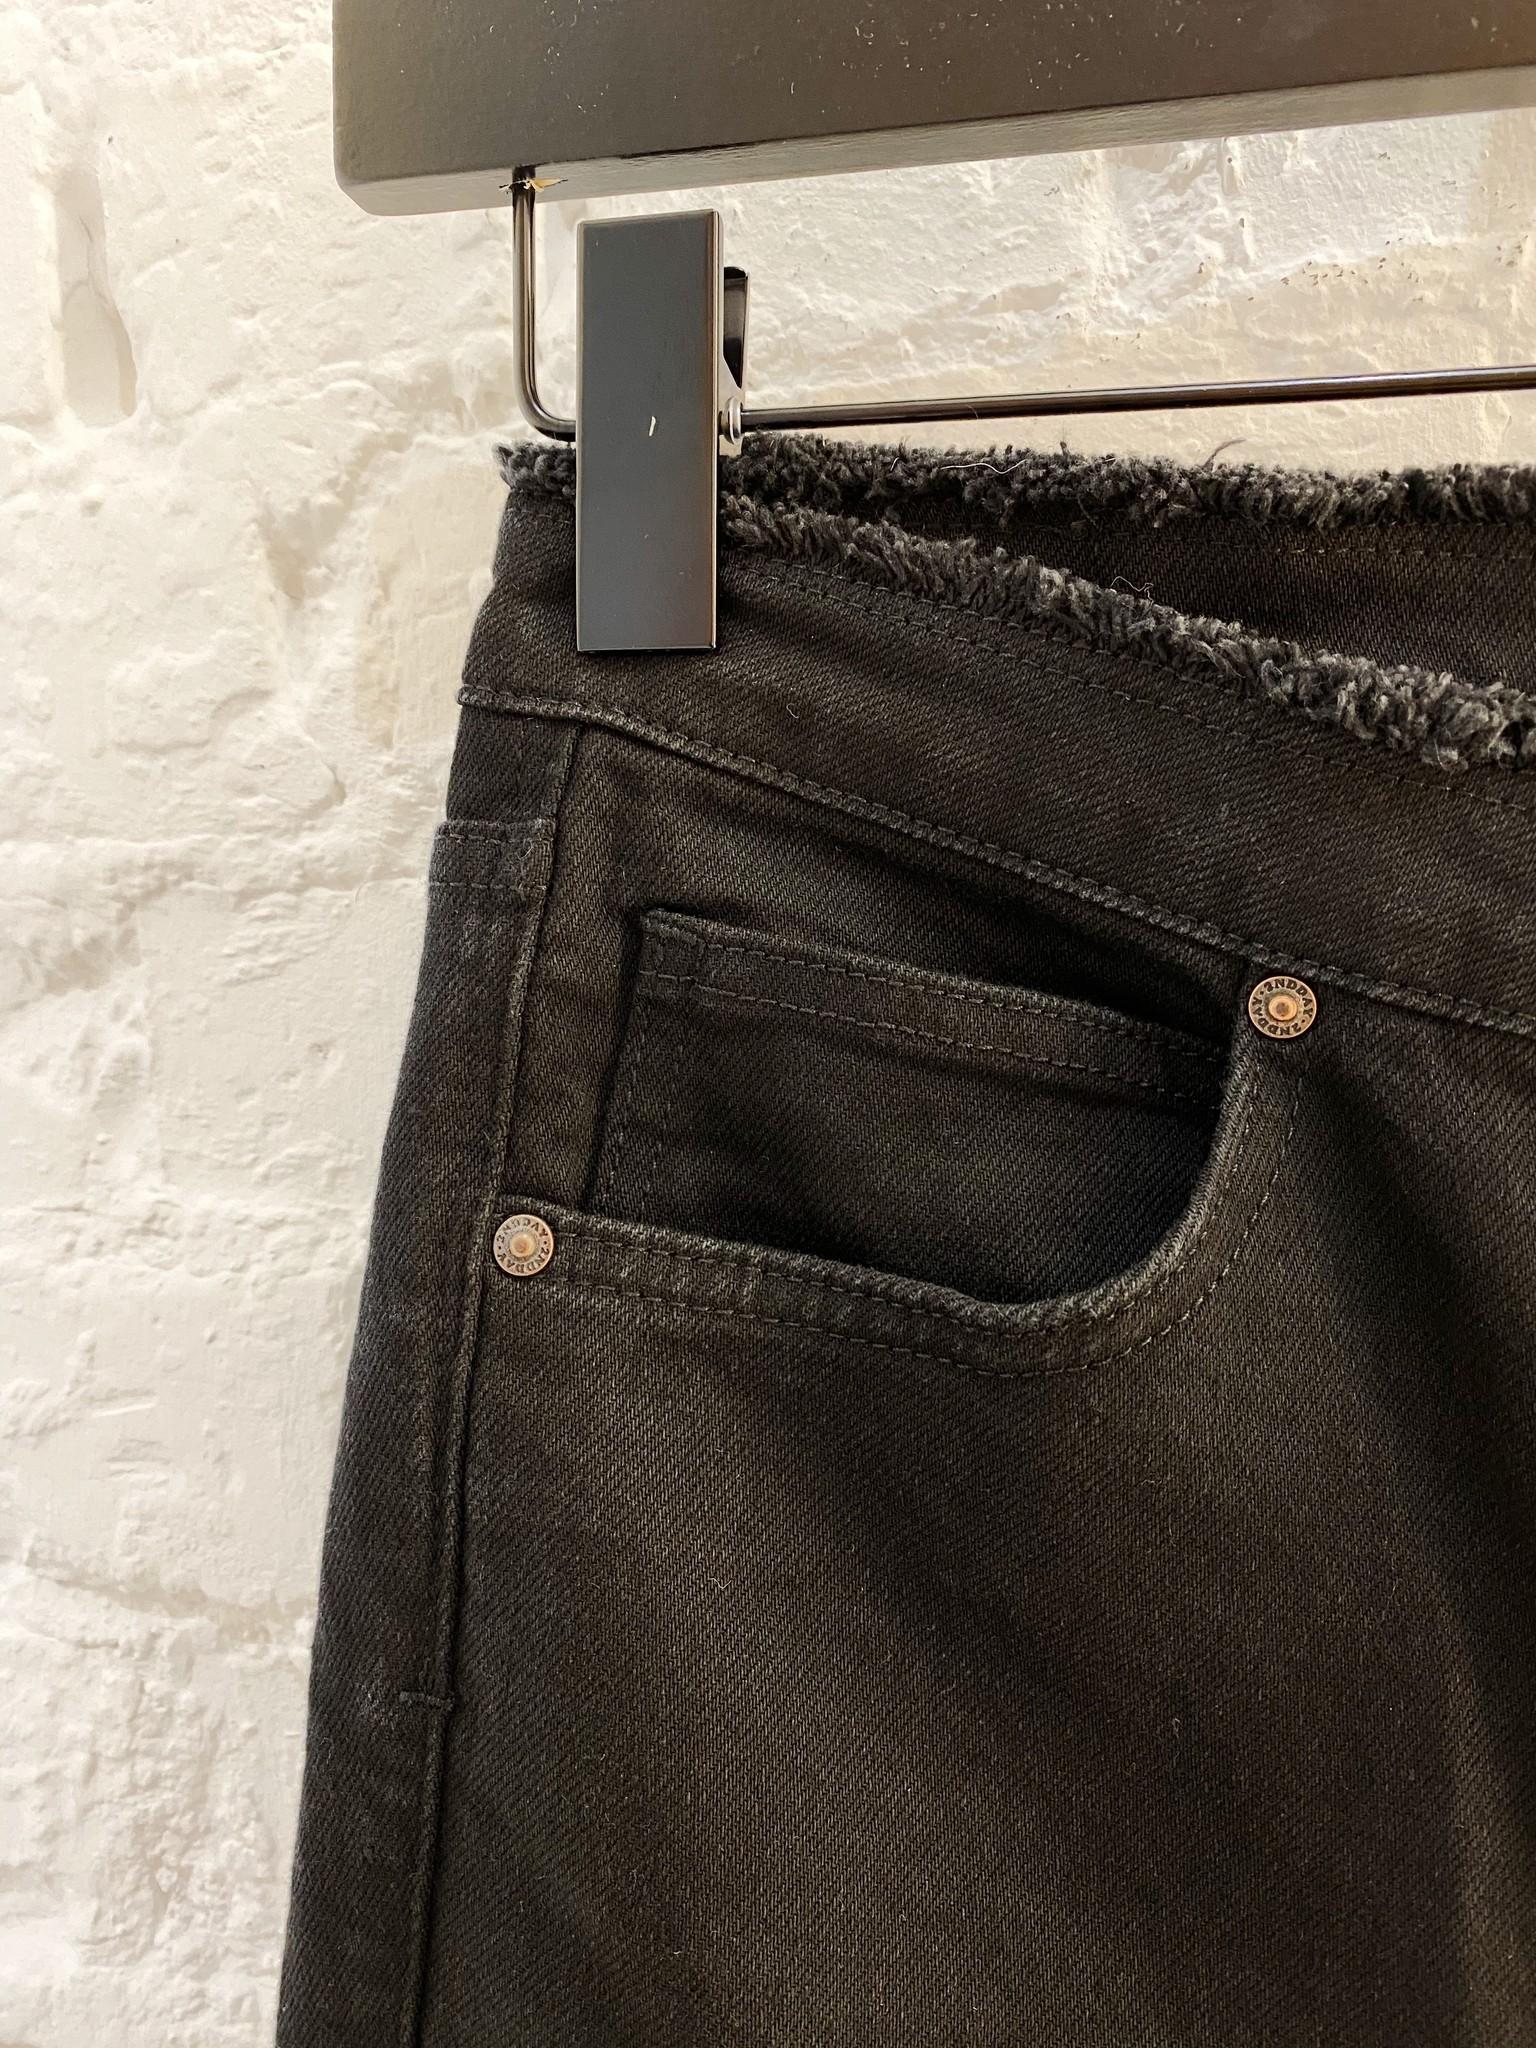 Riggis Jeans-7